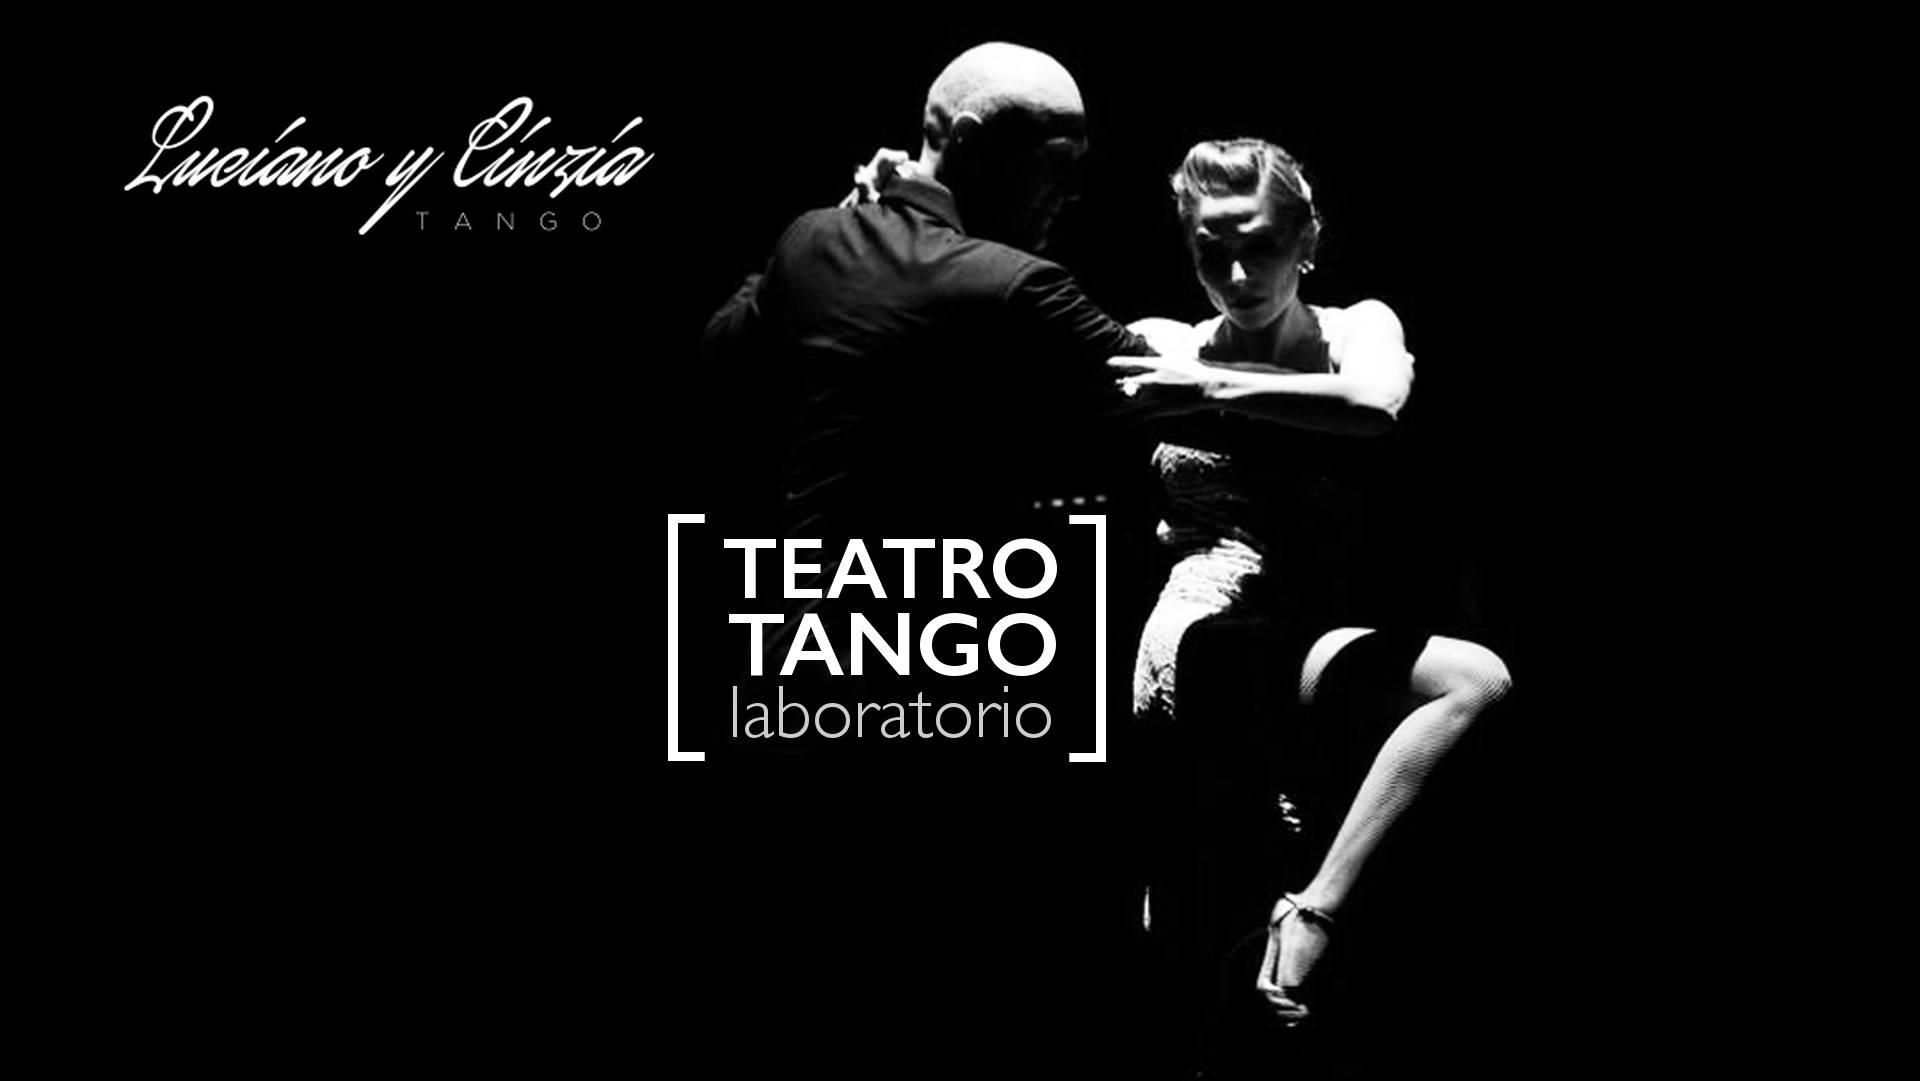 laboratorio teatro tango